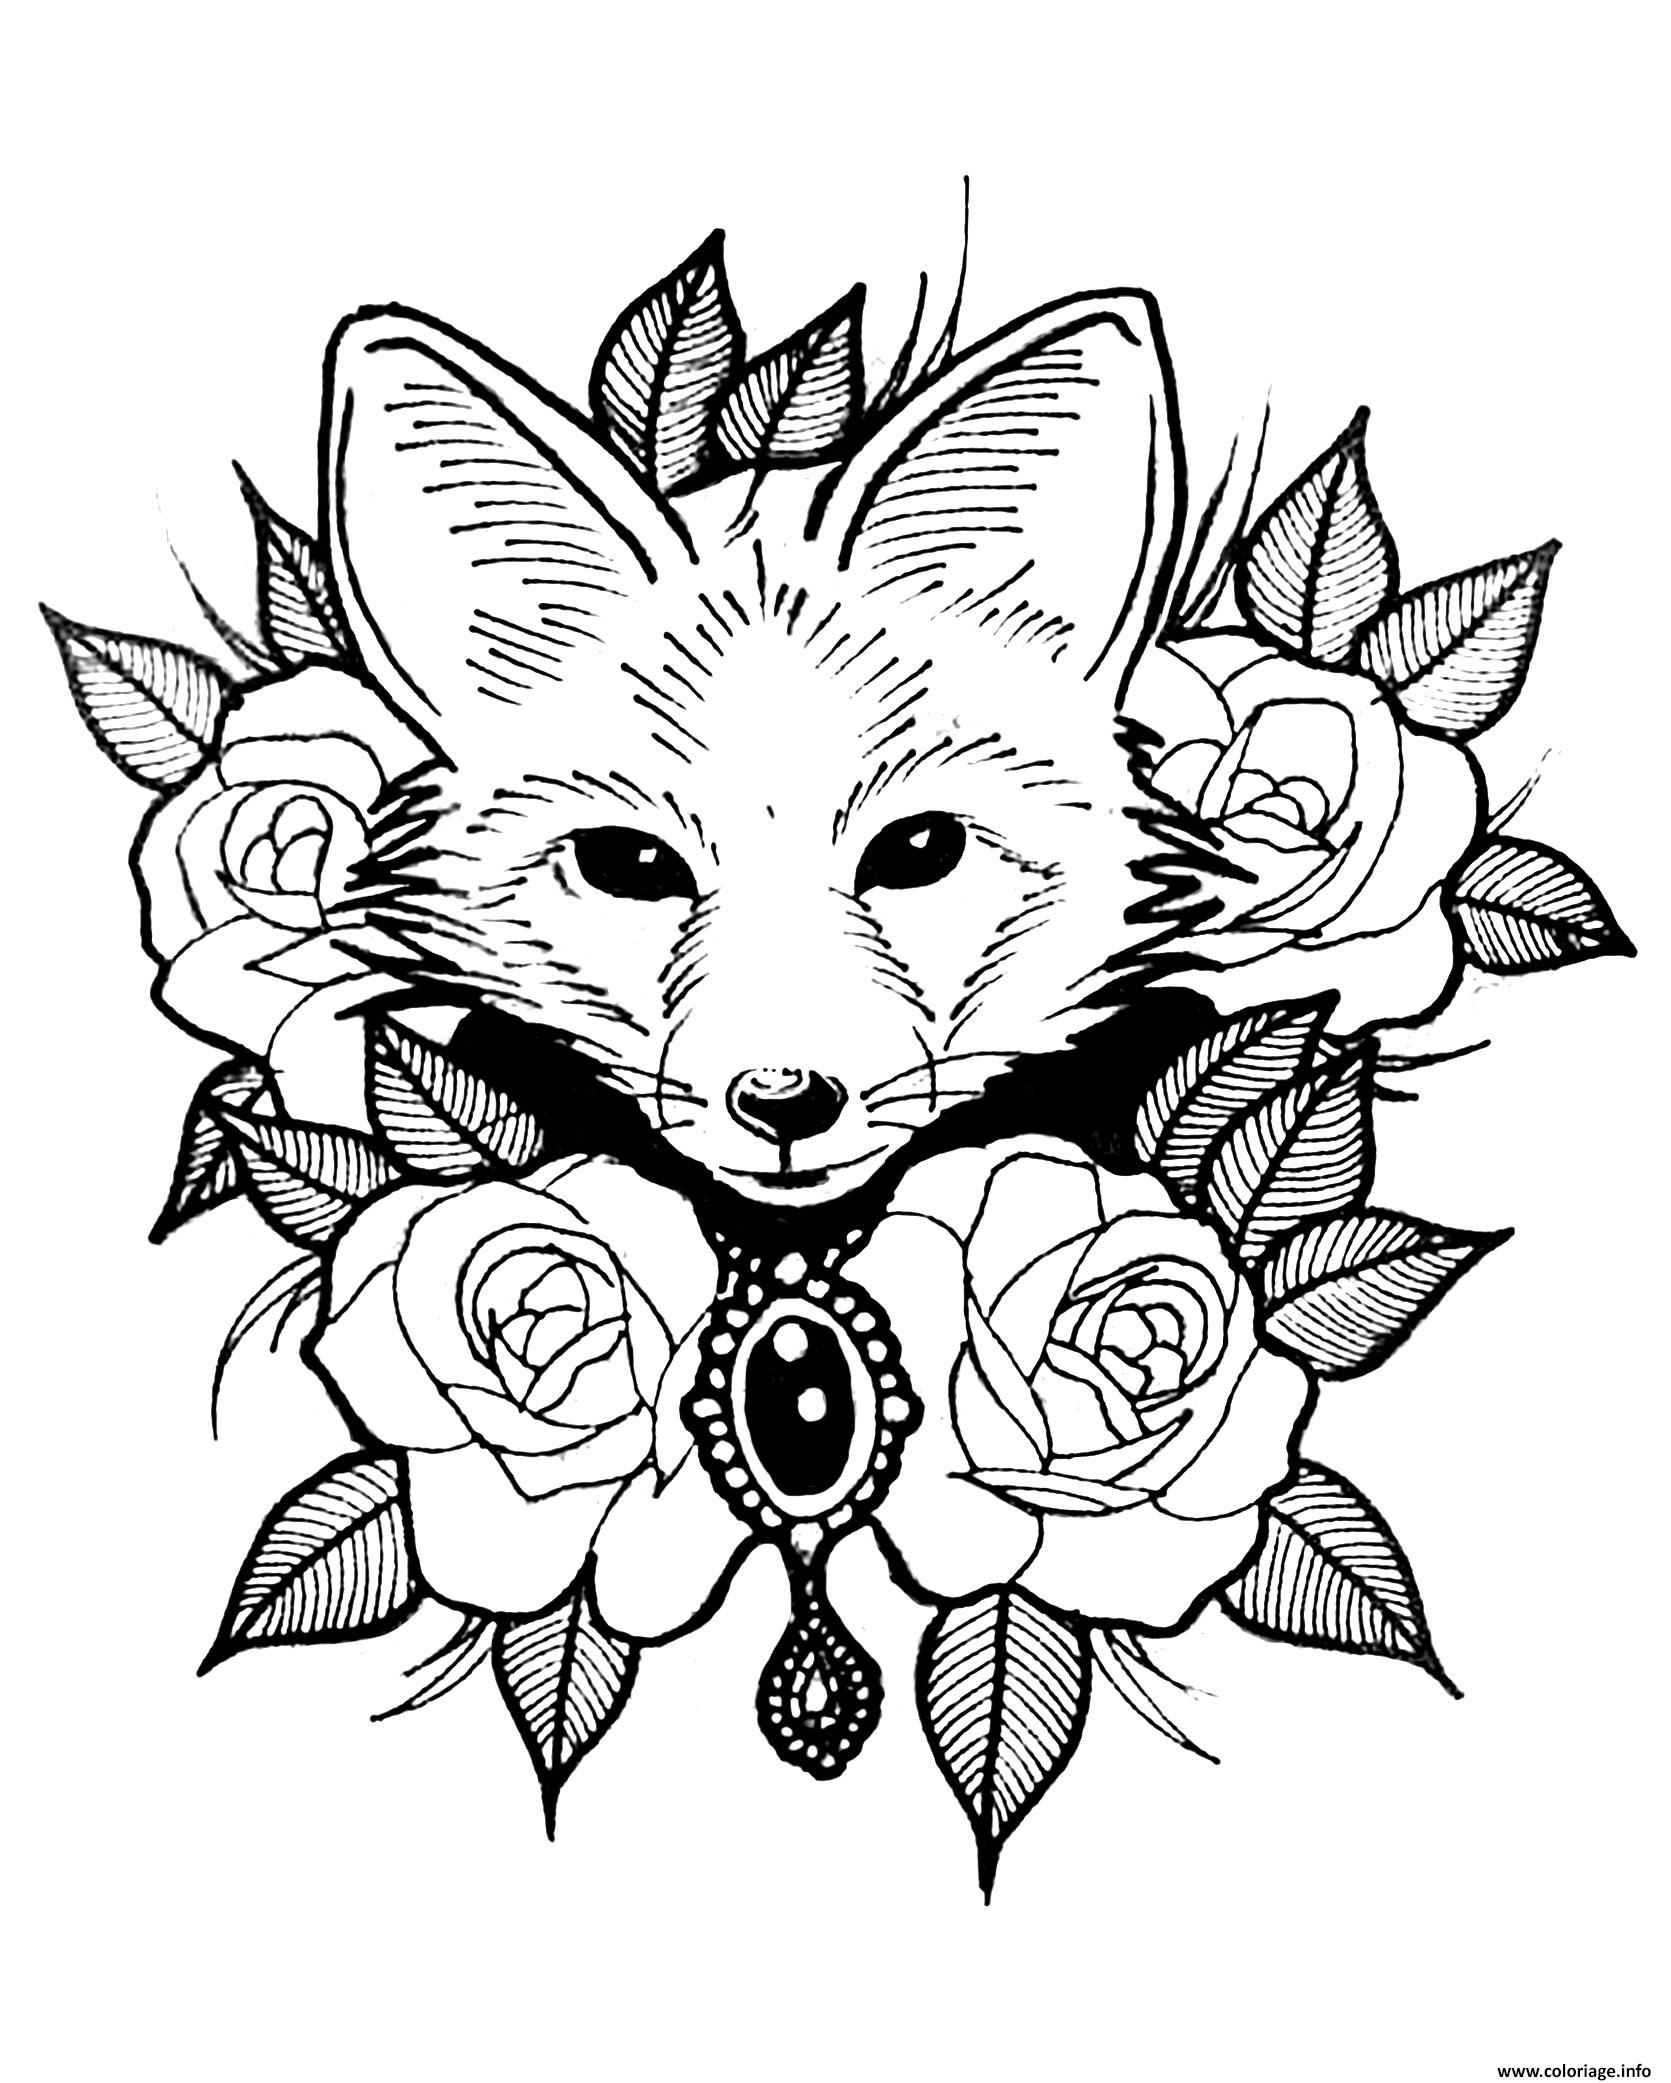 Coloriage Renard Et Roses Style Tatouage dessin